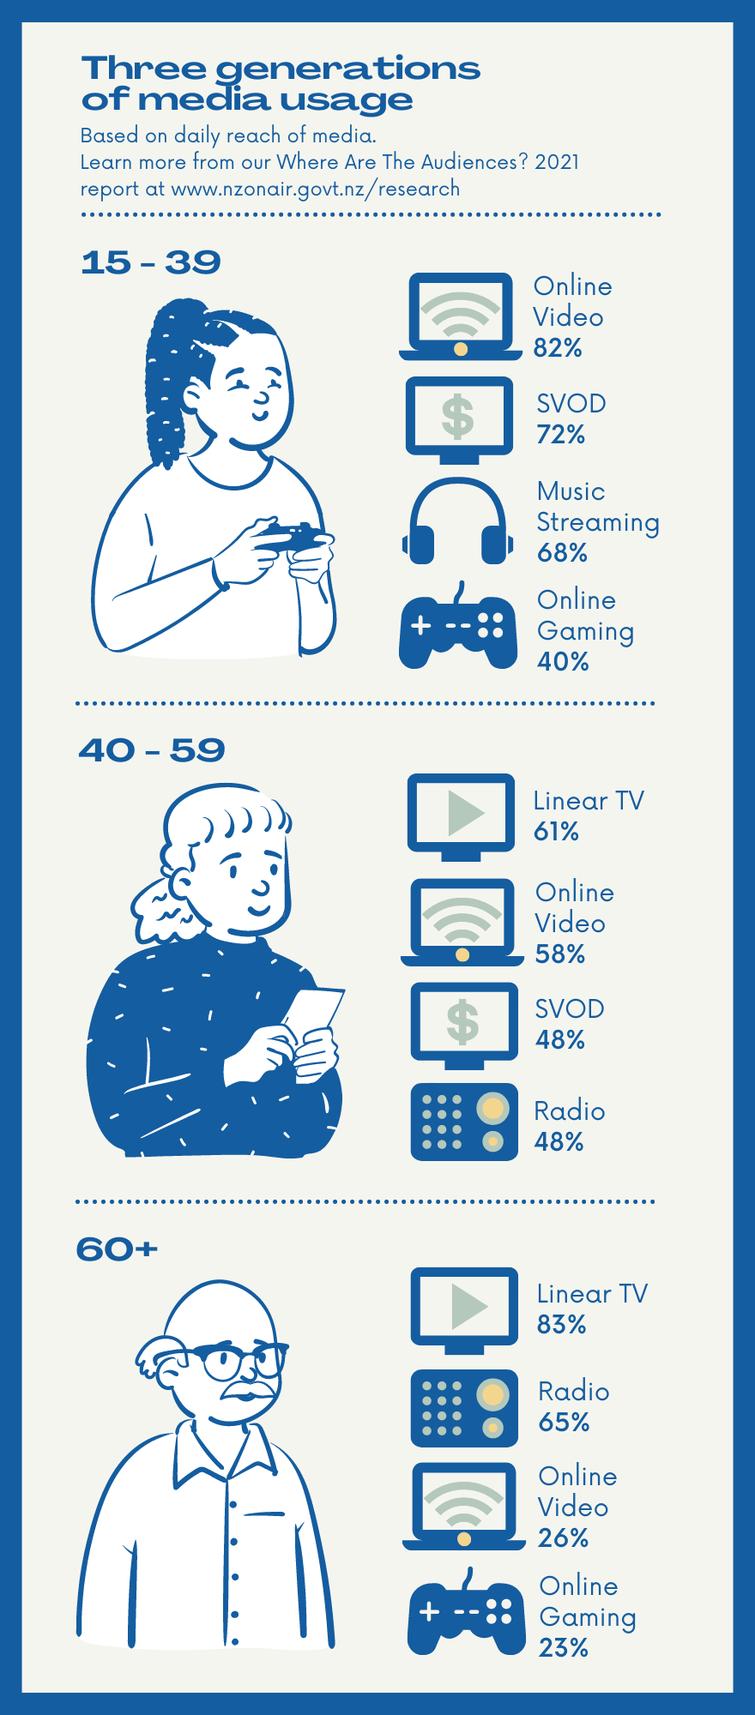 Three generations of media use